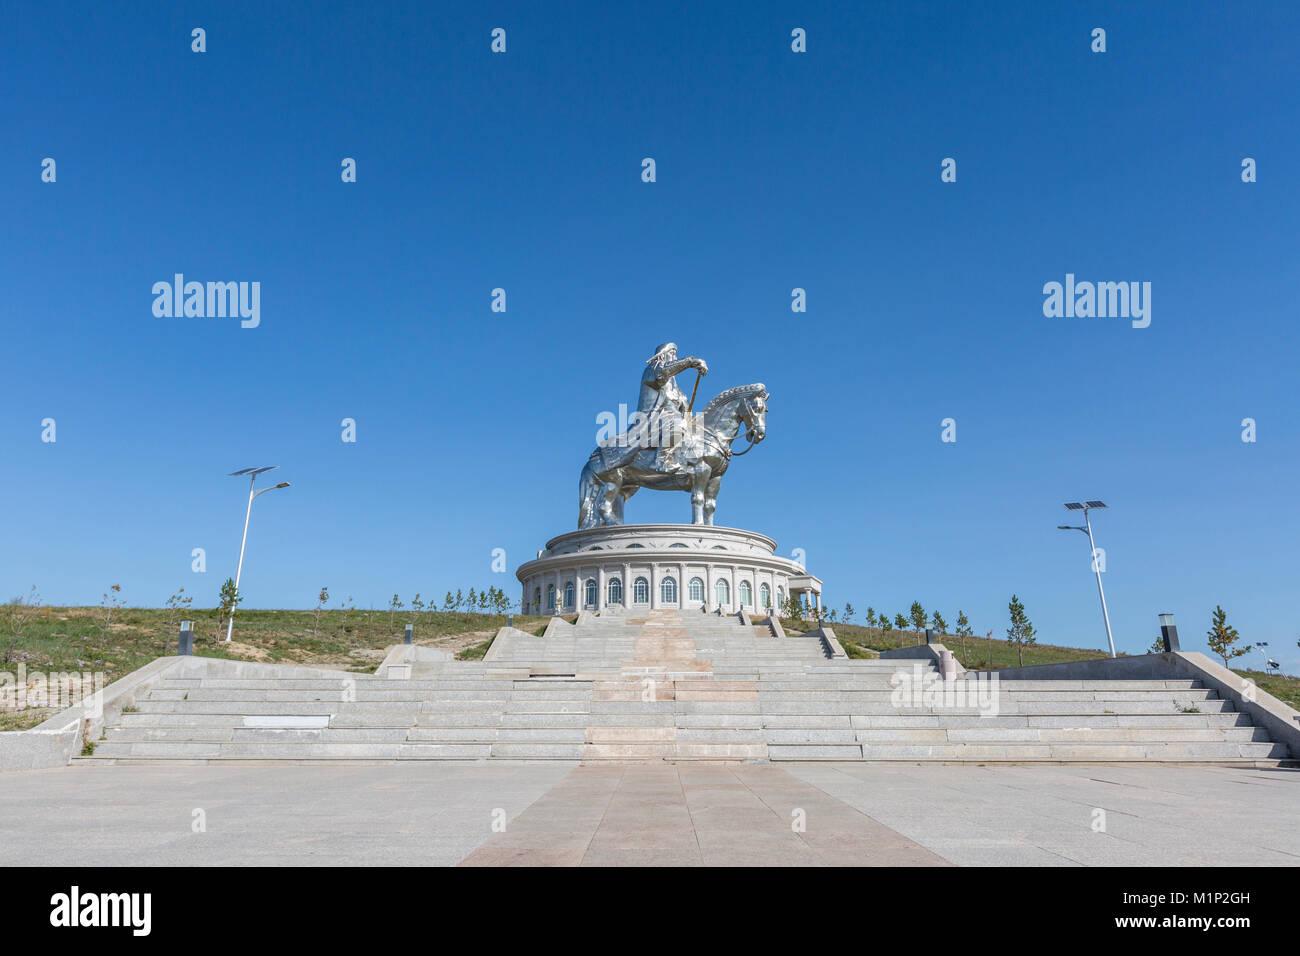 Treppen zu Dschingis Khan Statue Komplex, Nußdorf am Inn, Tov Provinz, Mongolei, Zentralasien, Asien Stockbild